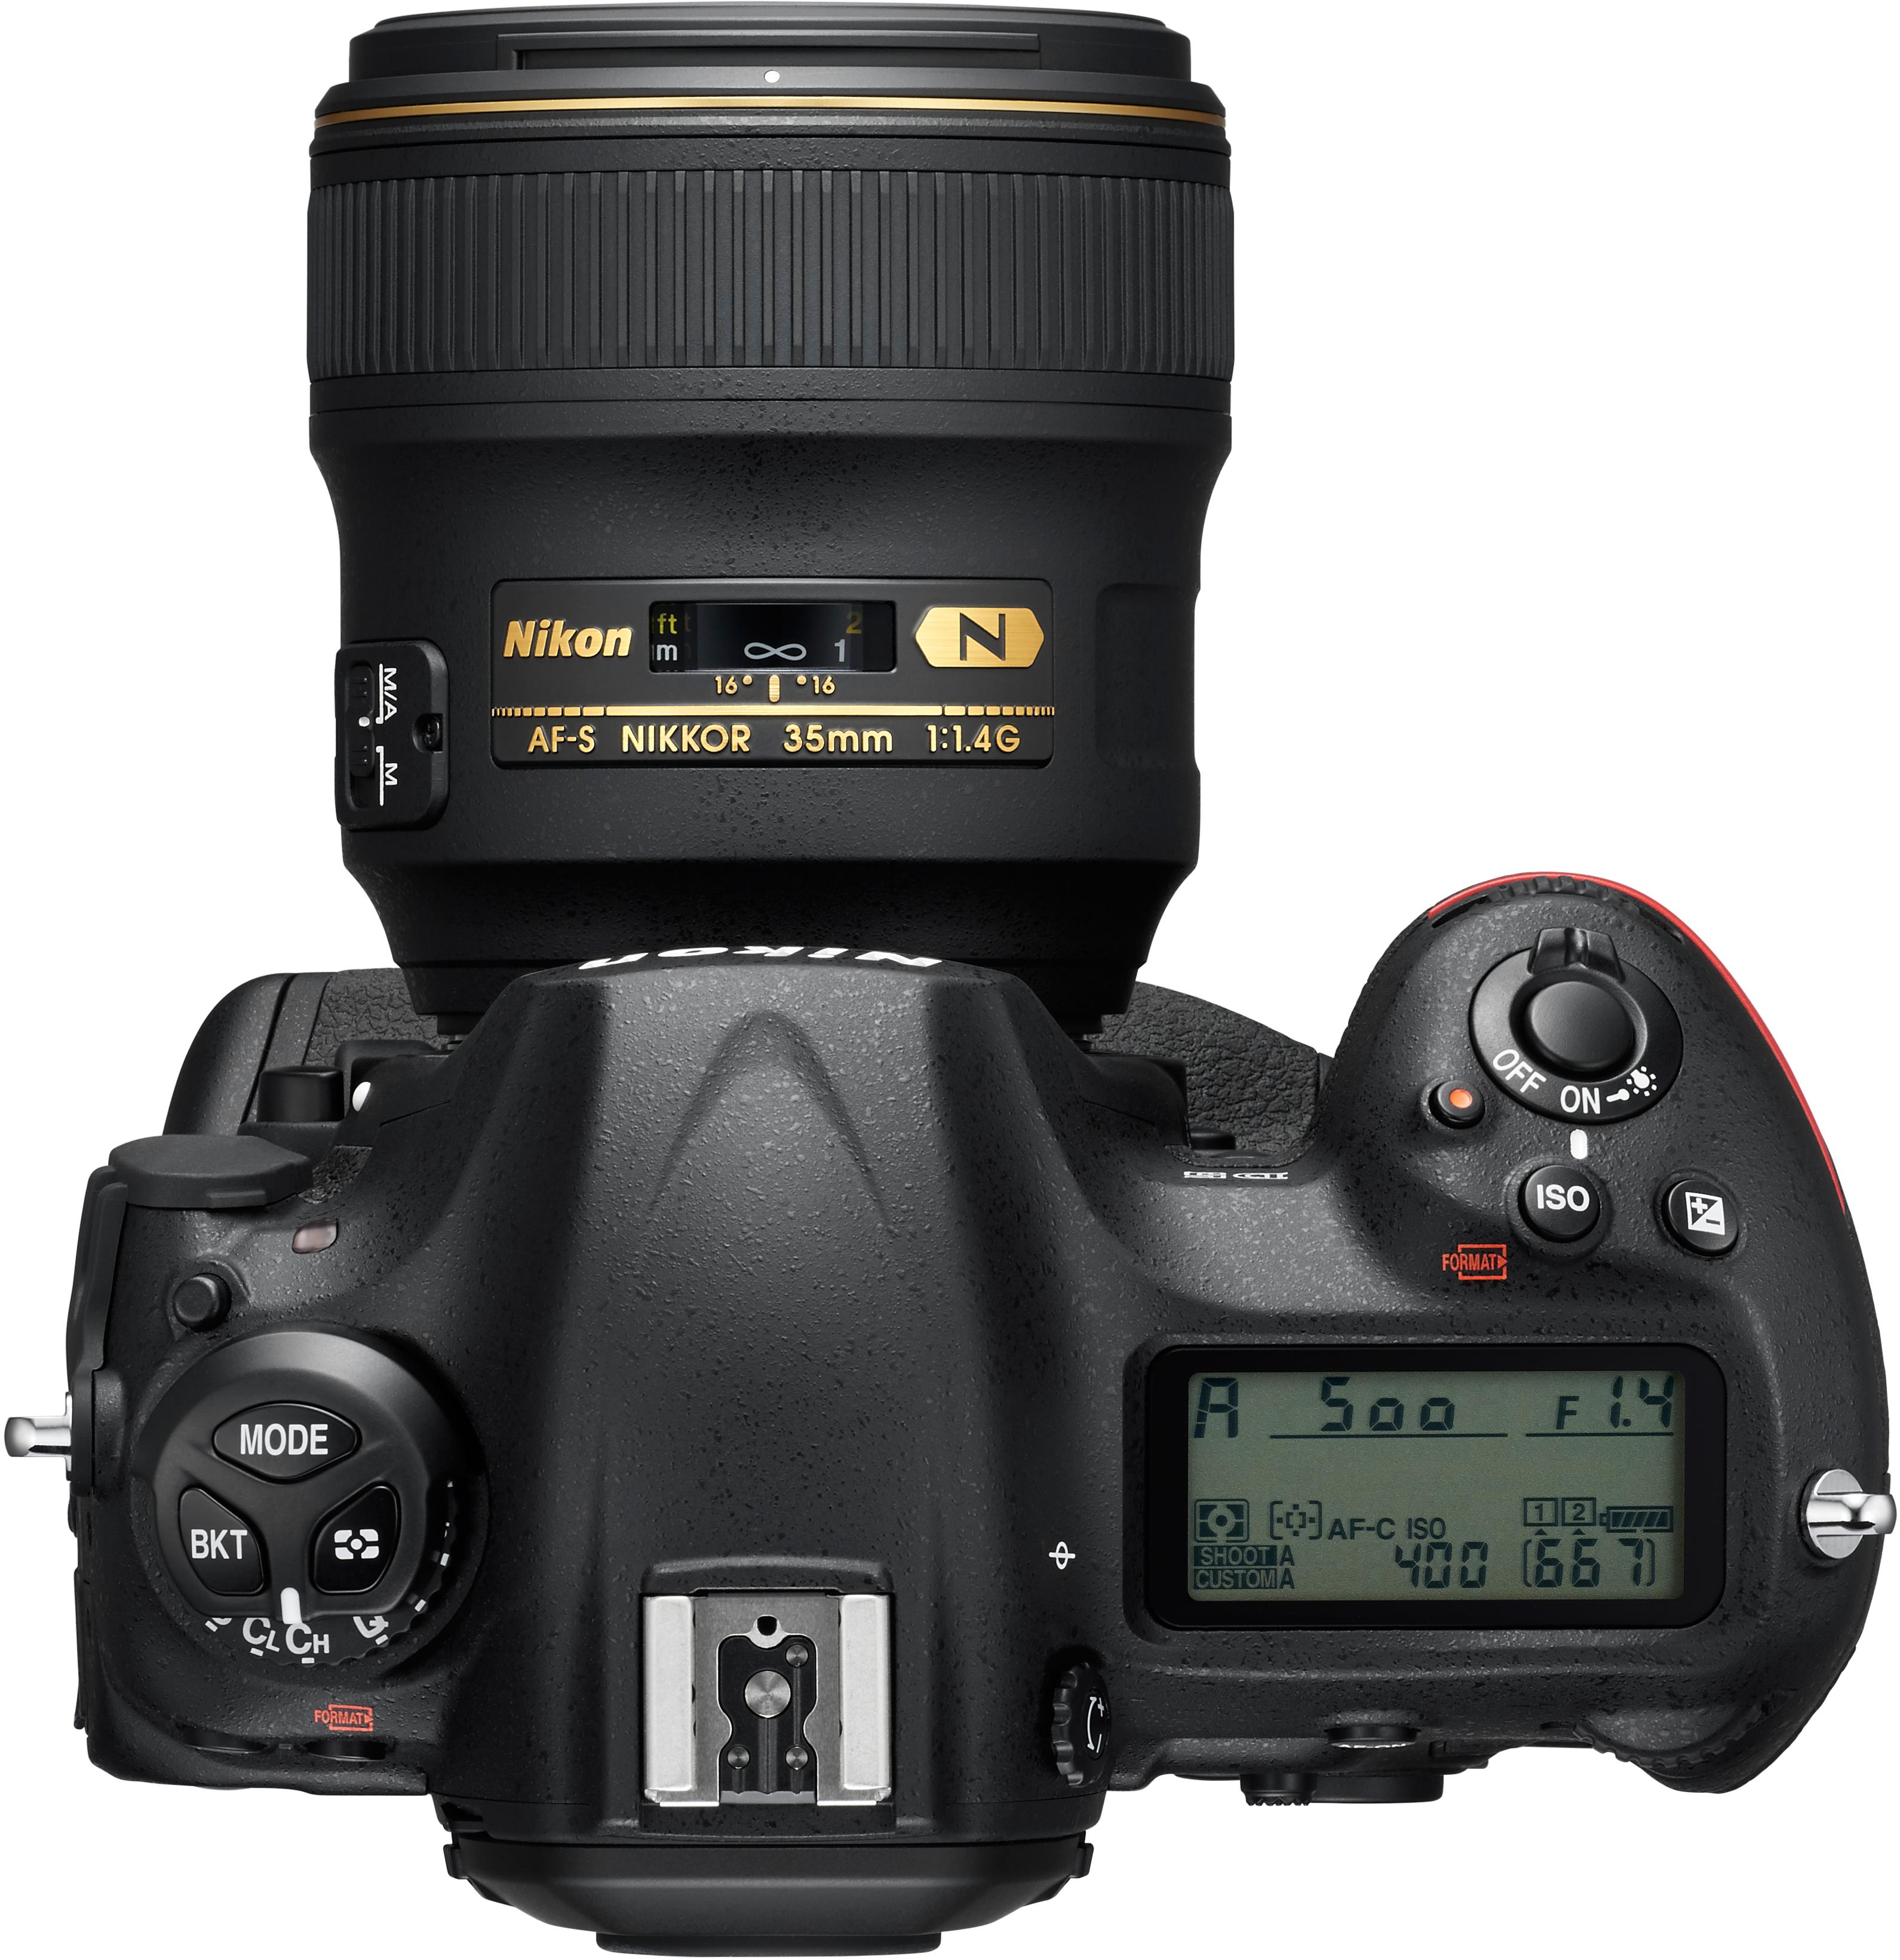 Unveiled: Nikon's 4K-Capable D5, DX-Format D500 & Radio